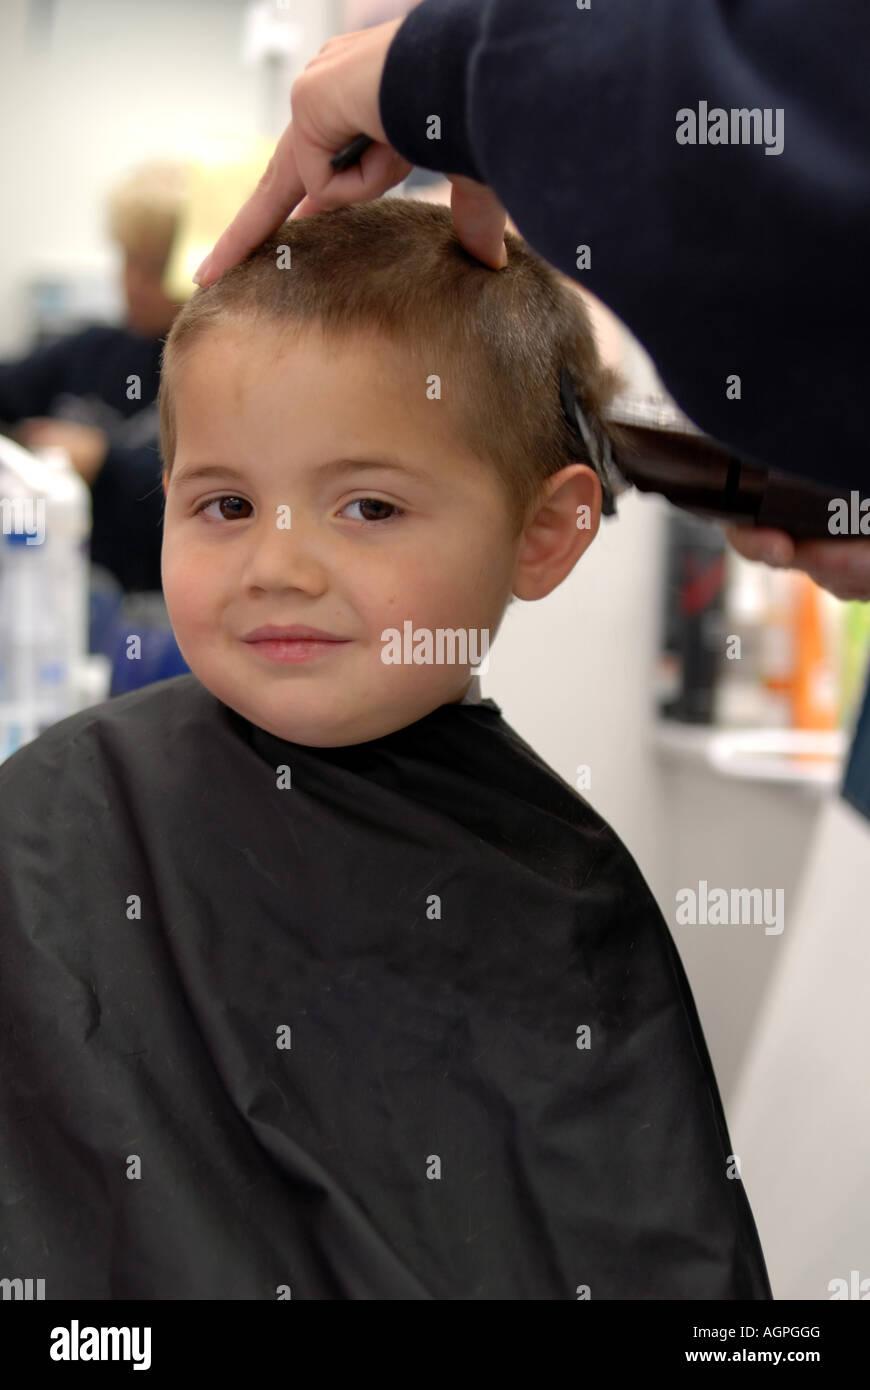 Butch Haircut Stock Photos Butch Haircut Stock Images Alamy